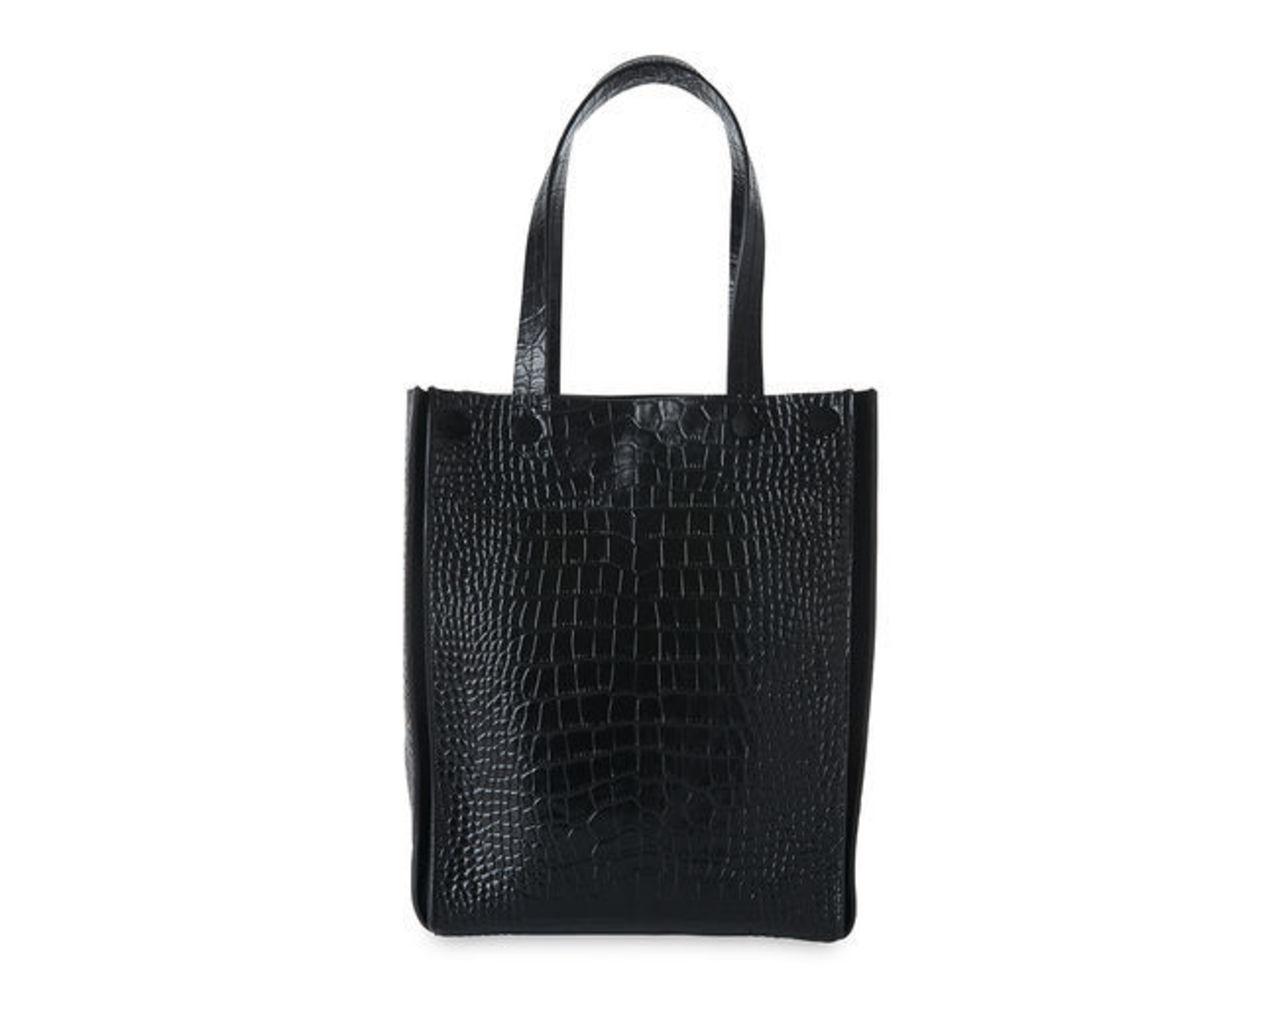 Croc Suede Mix Tote Bag